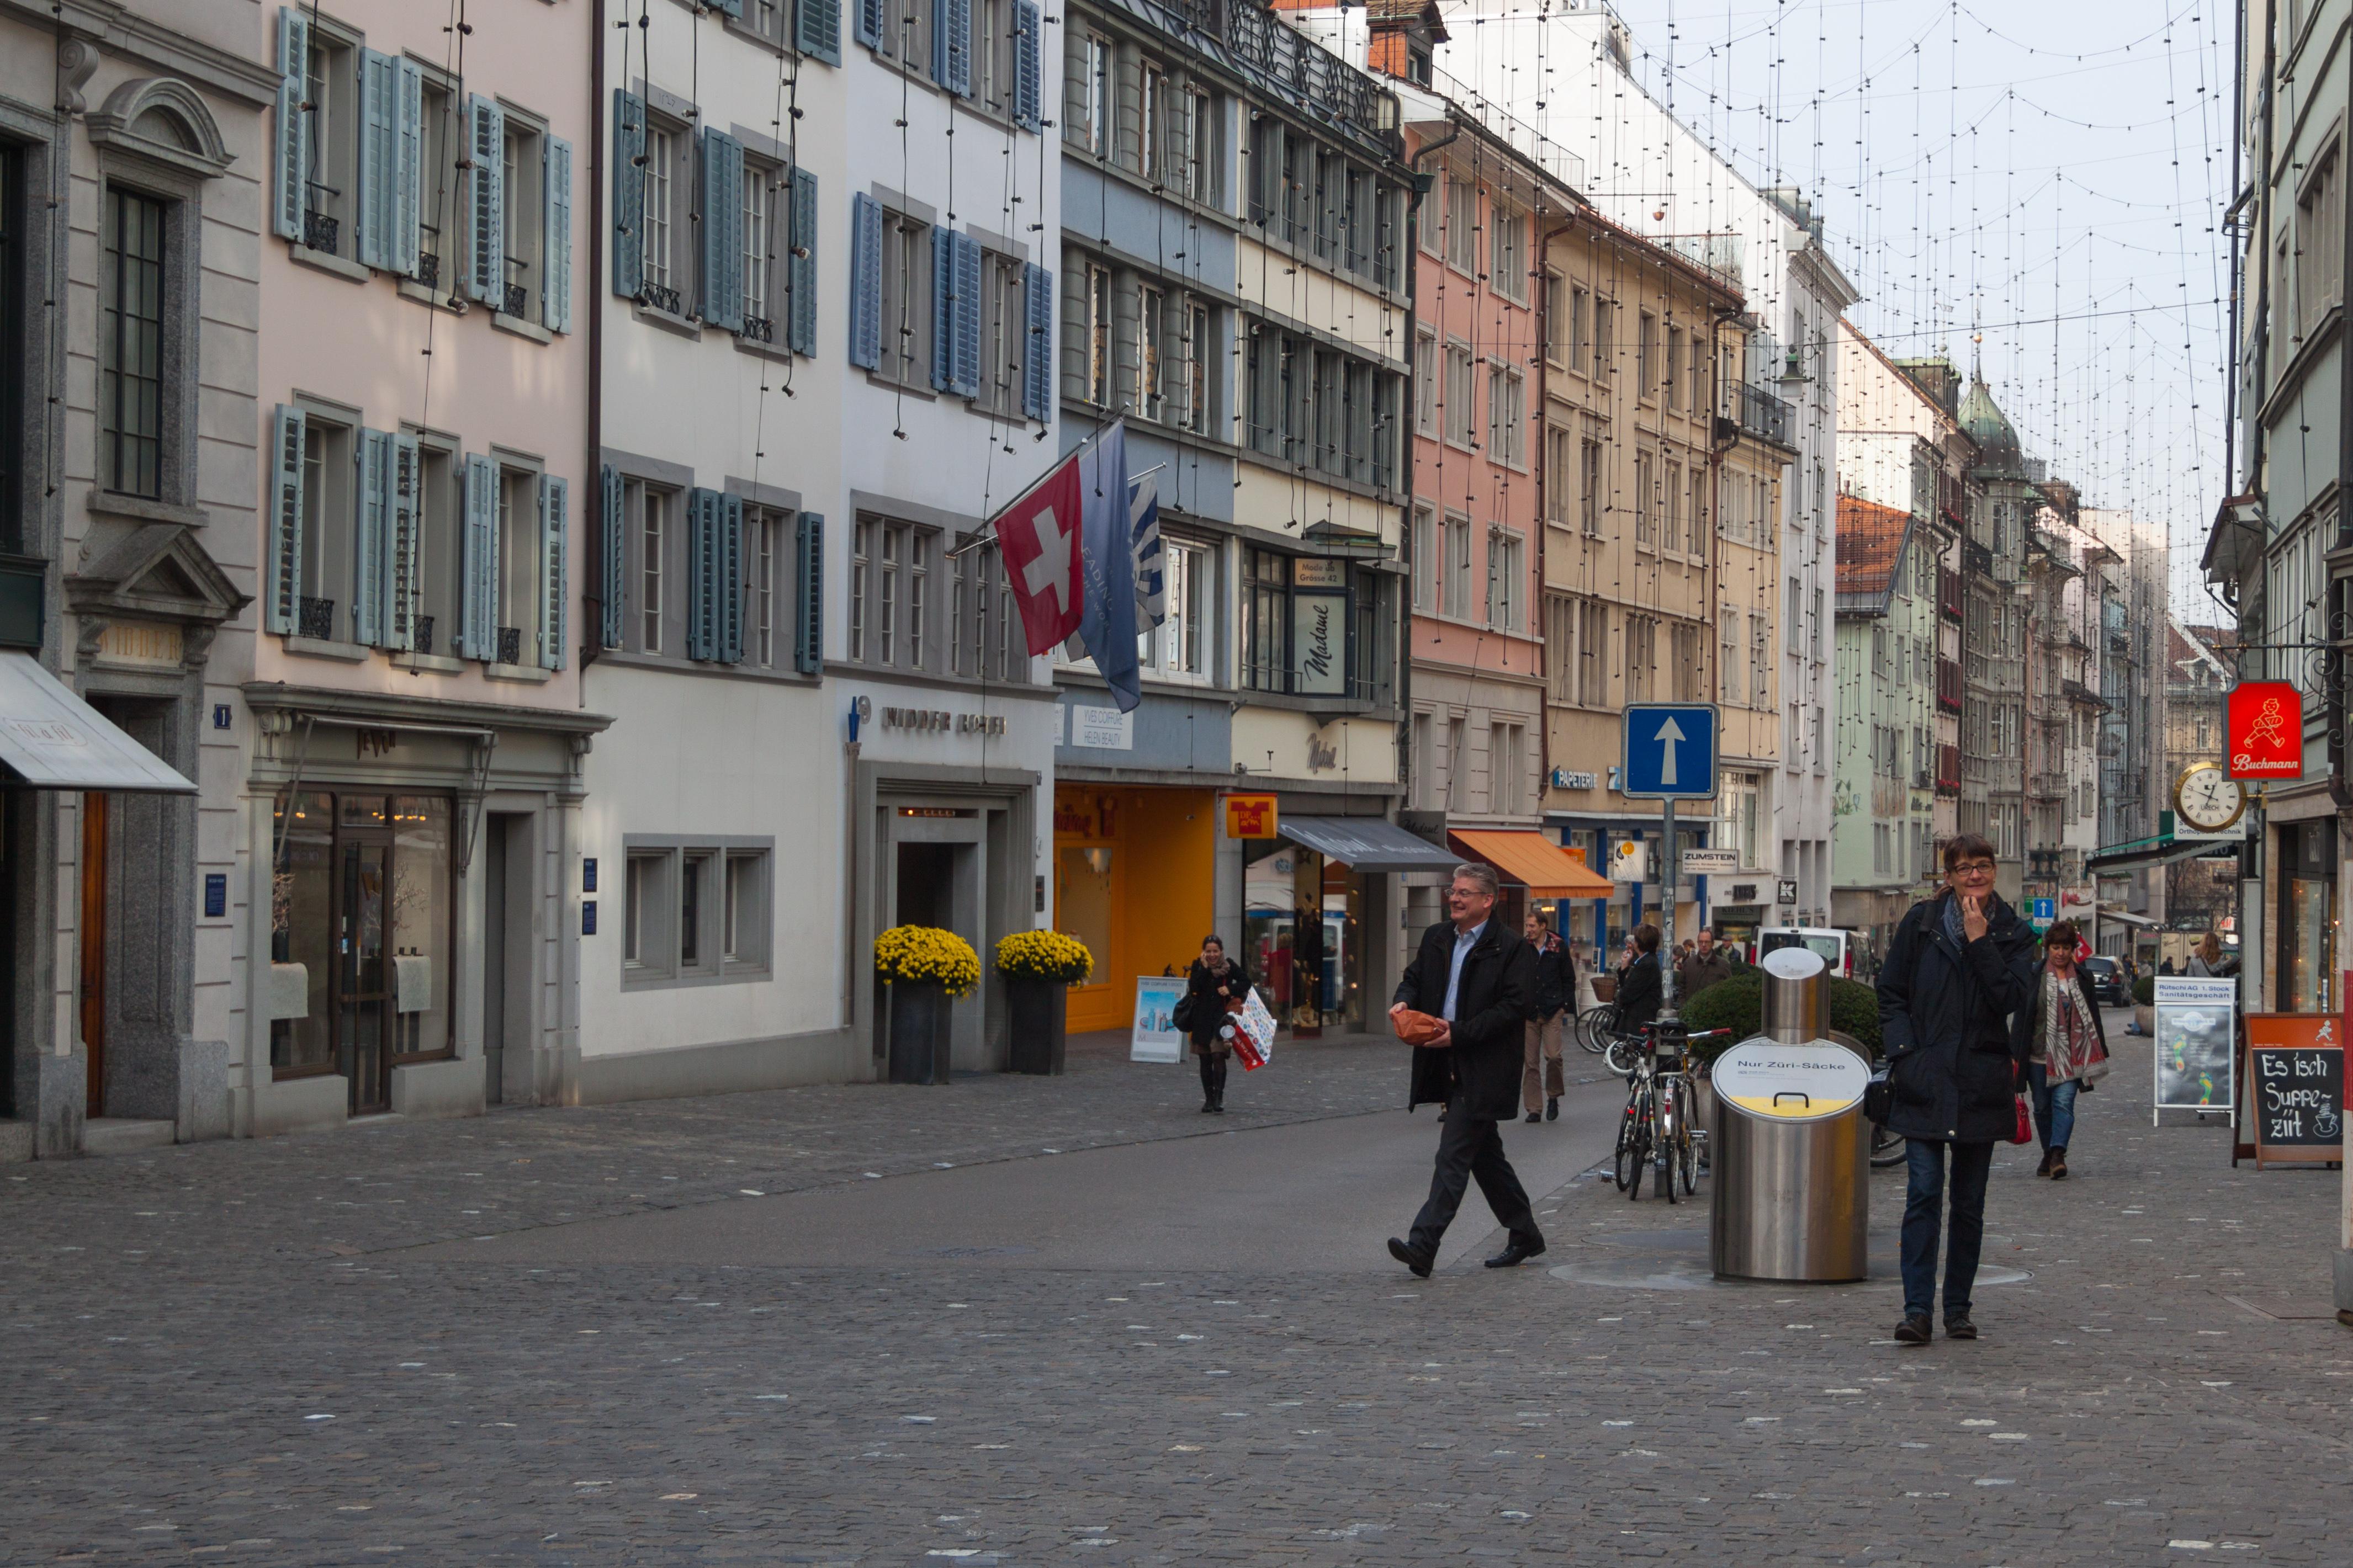 Dating Zürich gratis